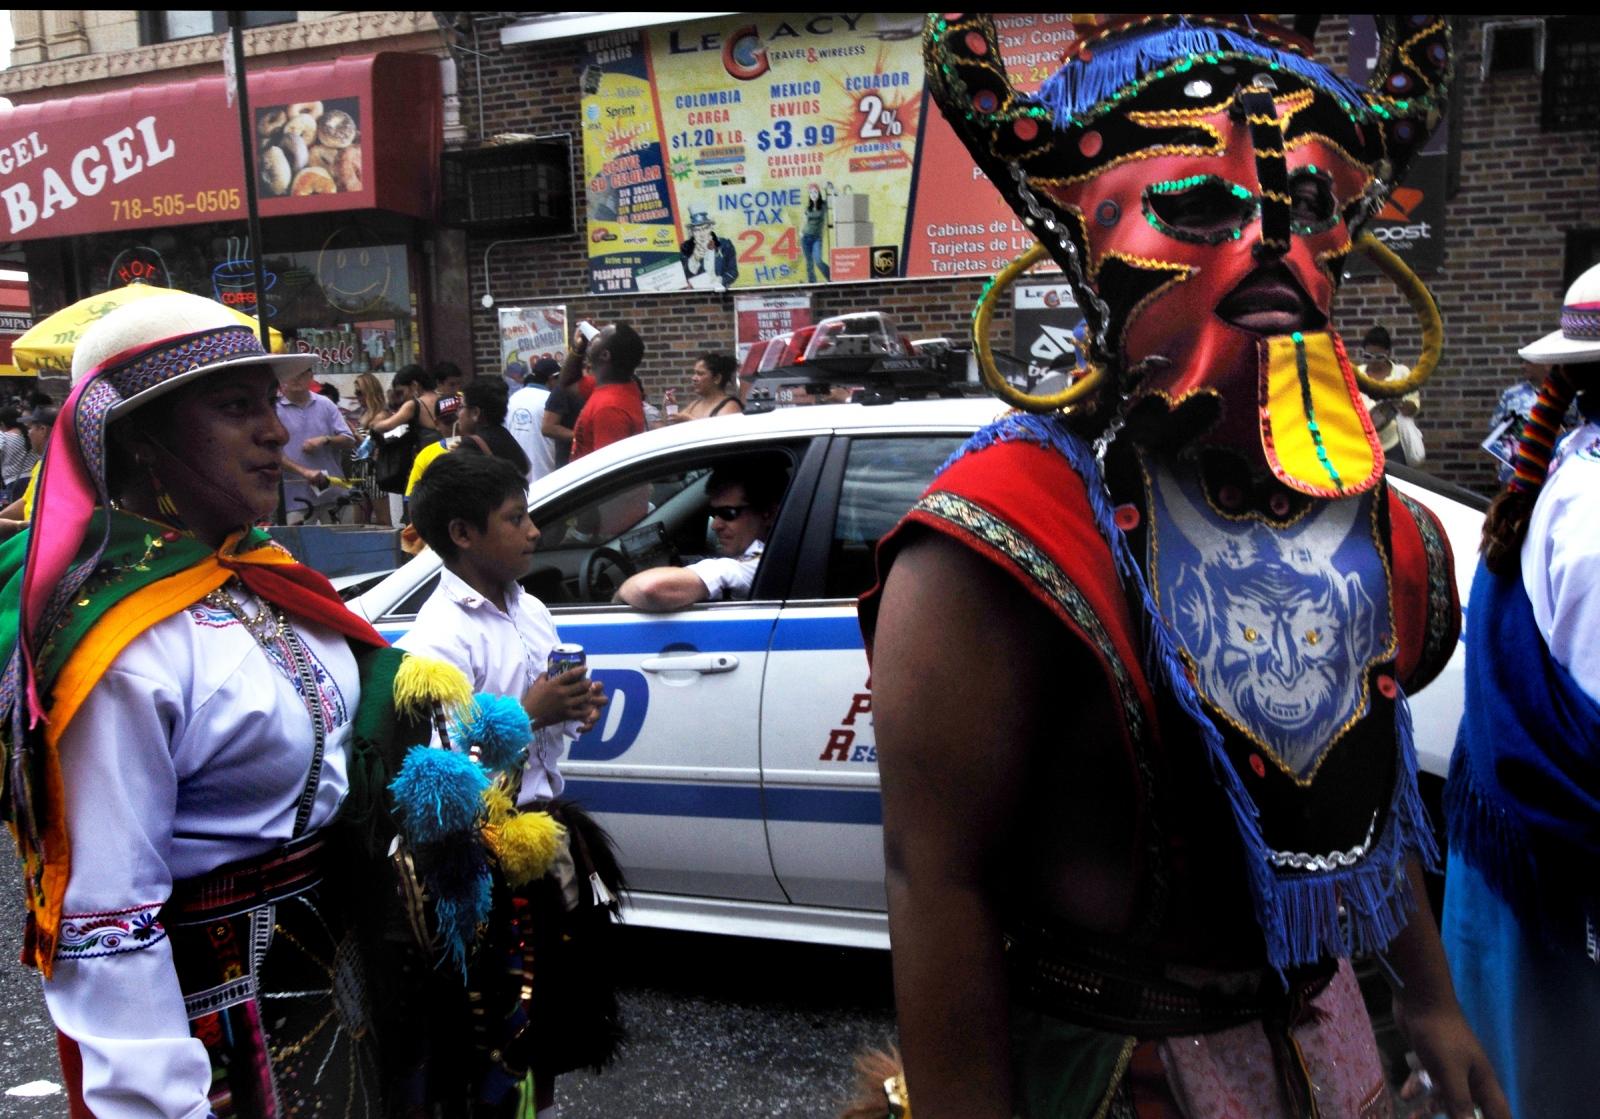 Jackson Heights 's streets celebrating independence of Ecuador in spanish neigborhood Queens